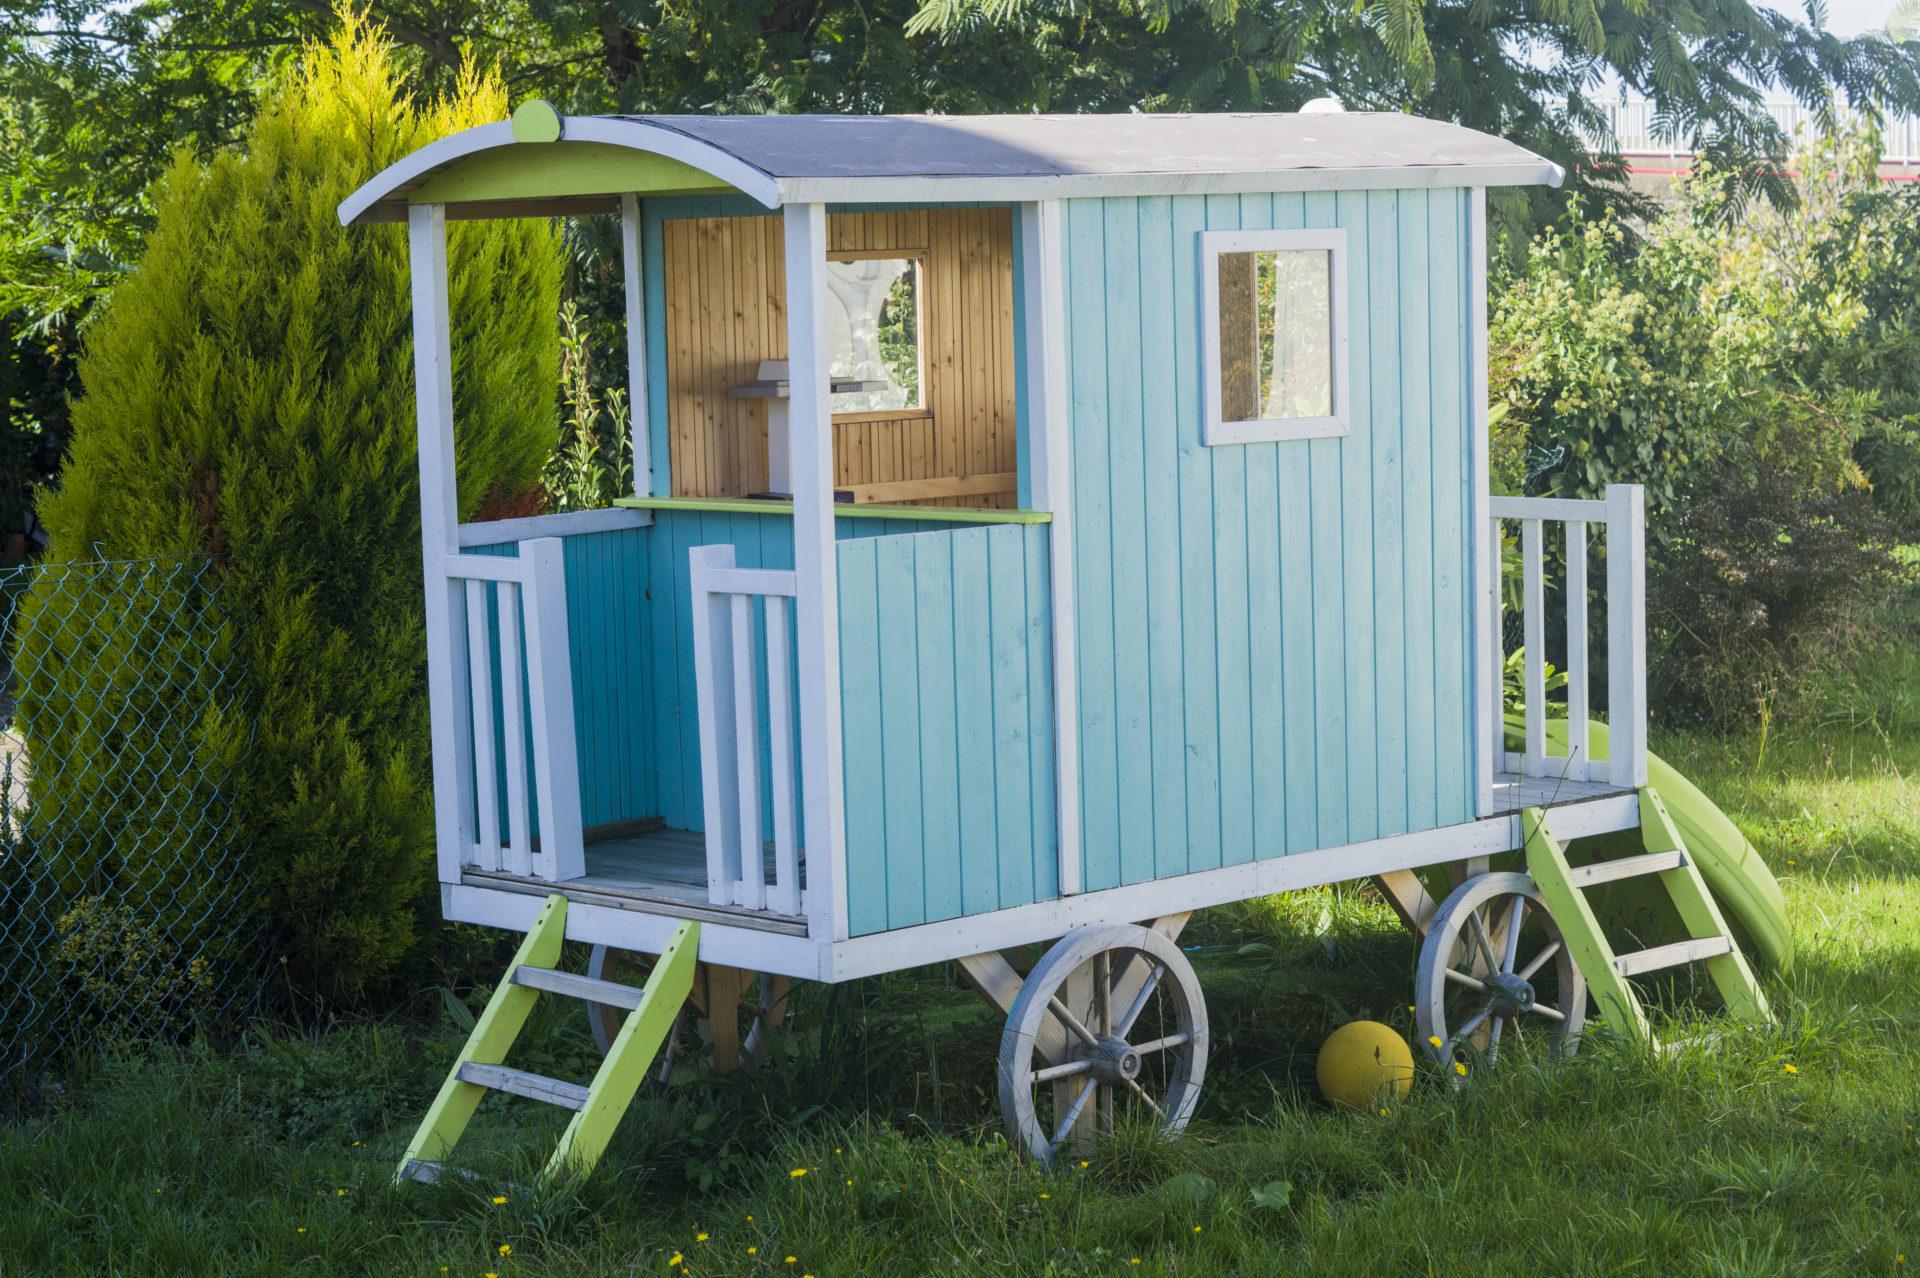 Cabane En Bois Pour Enfant, Cabane Jardin Enfant - Acheter ... dedans Cabane De Jardin Pour Enfants